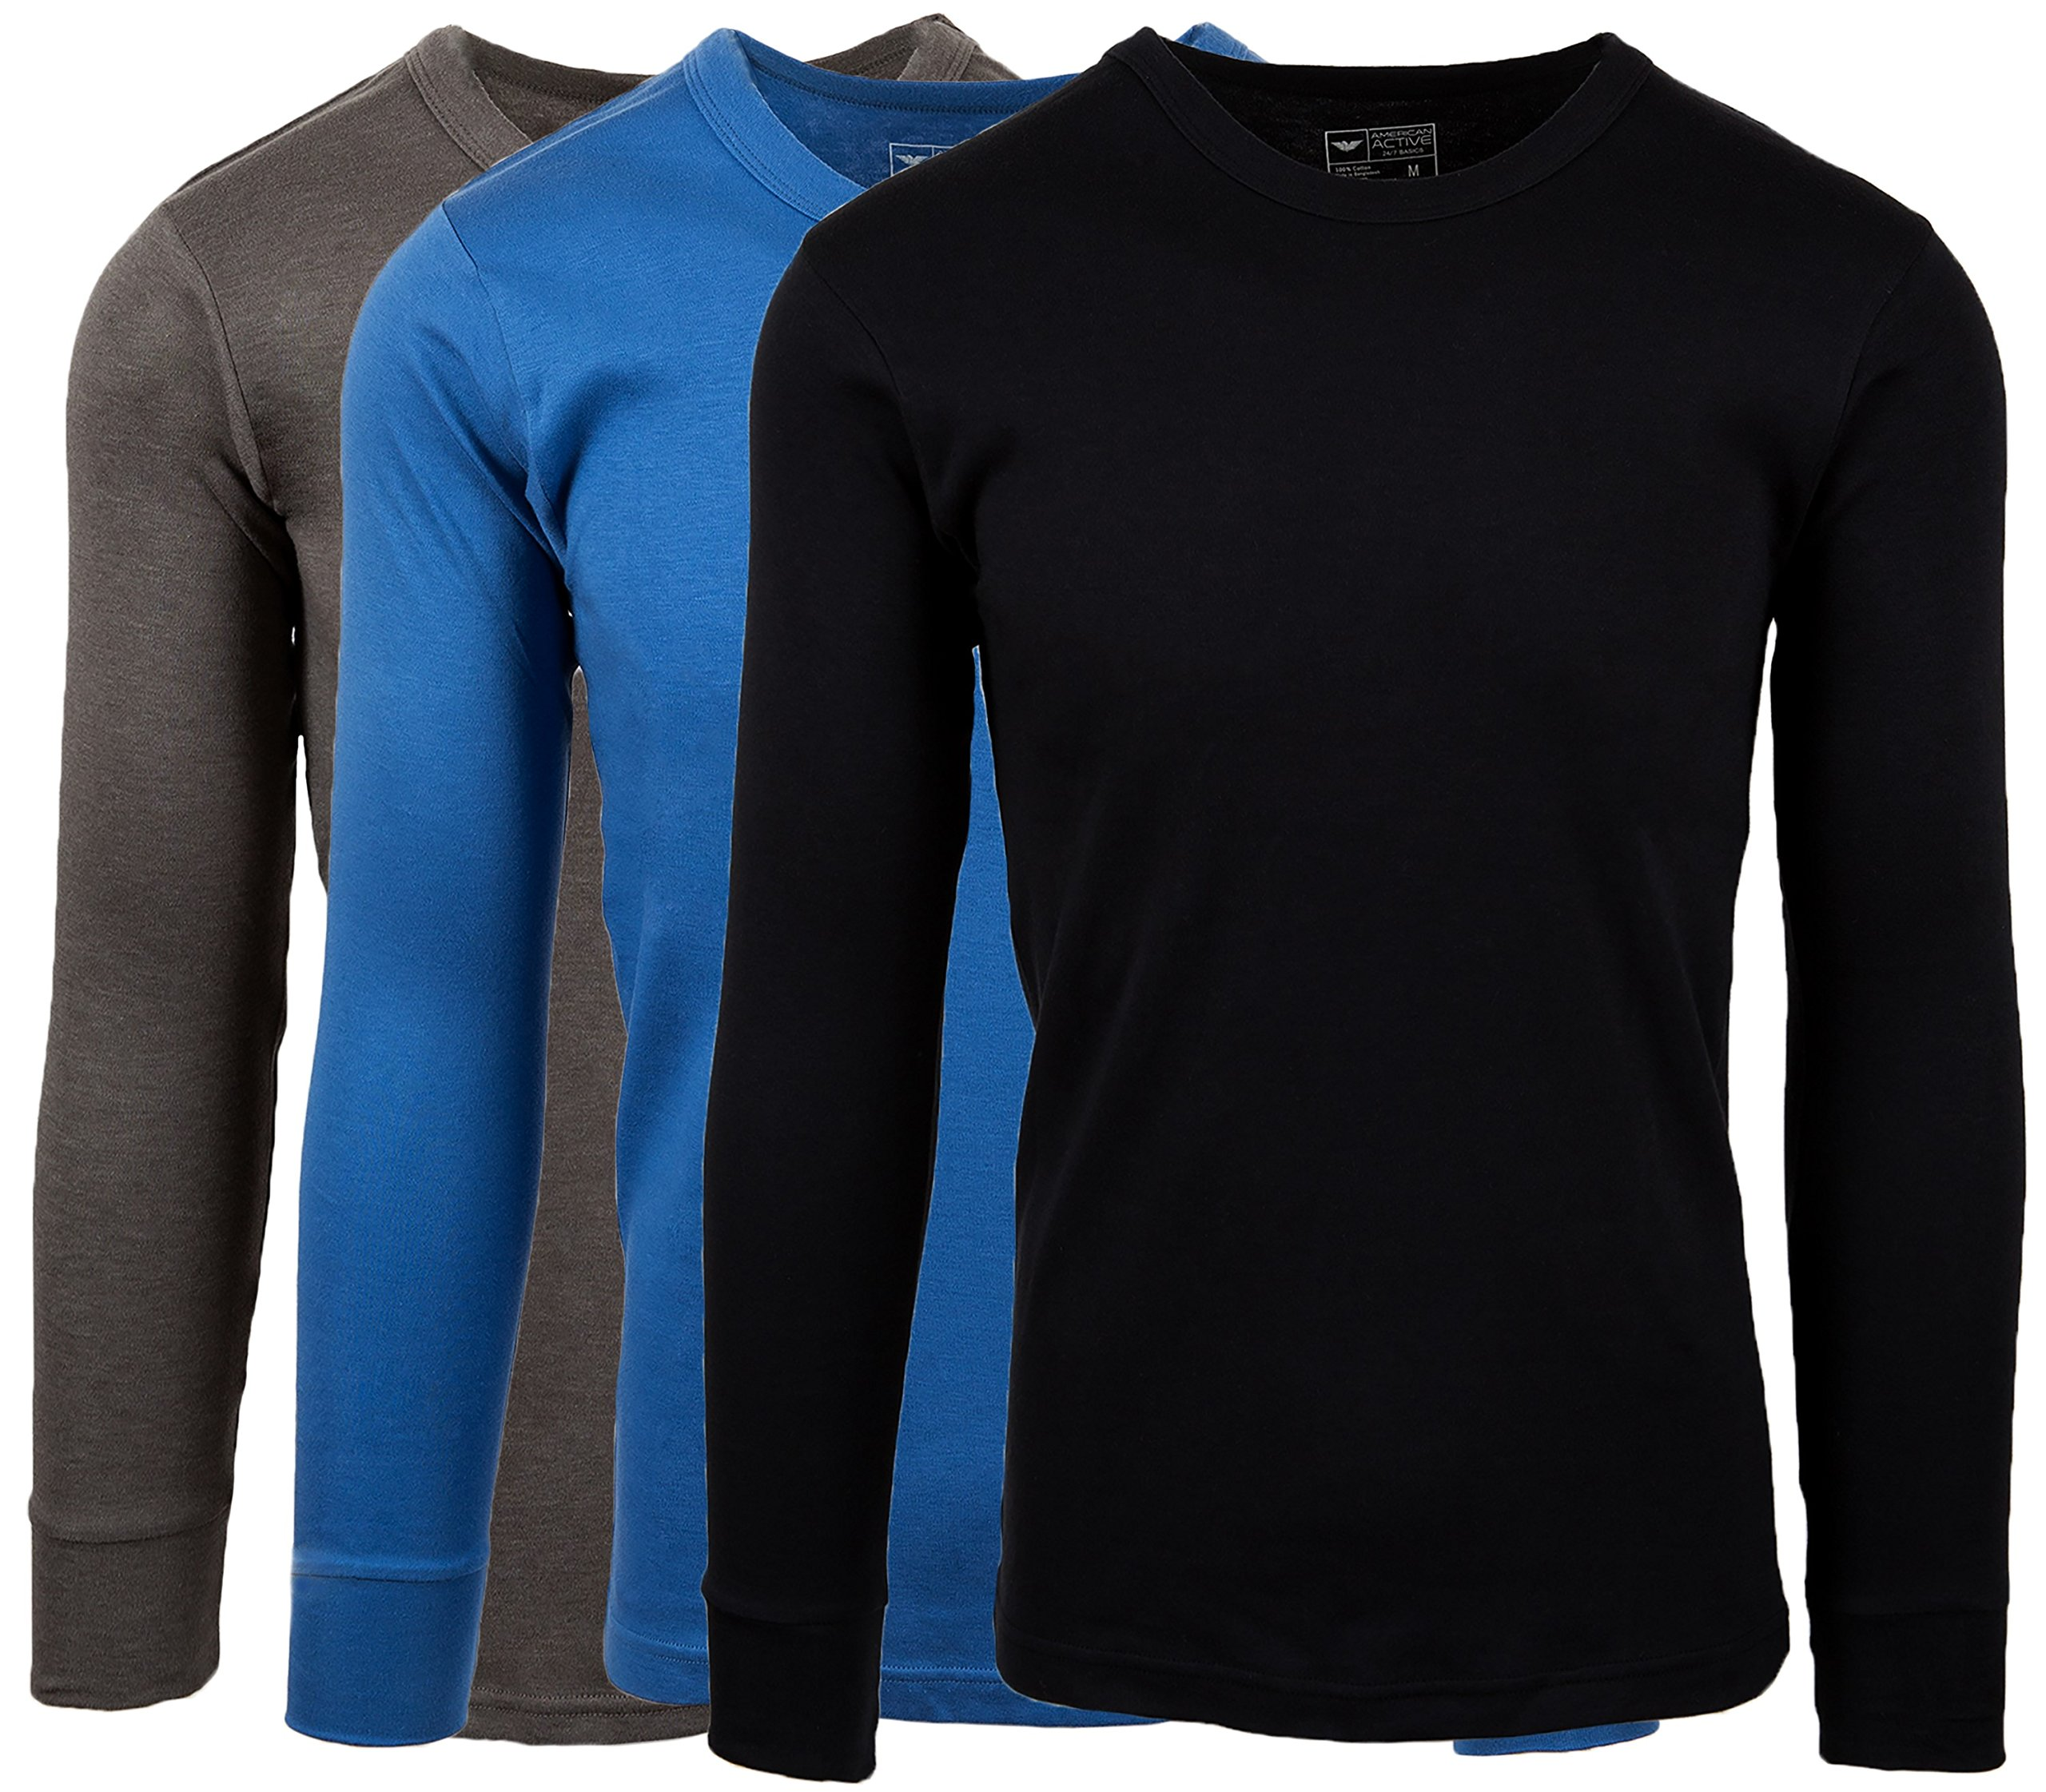 AMERICAN ACTIVE *男性の綿ウール裏地バッキング長袖Tシャツ暖かいの三組